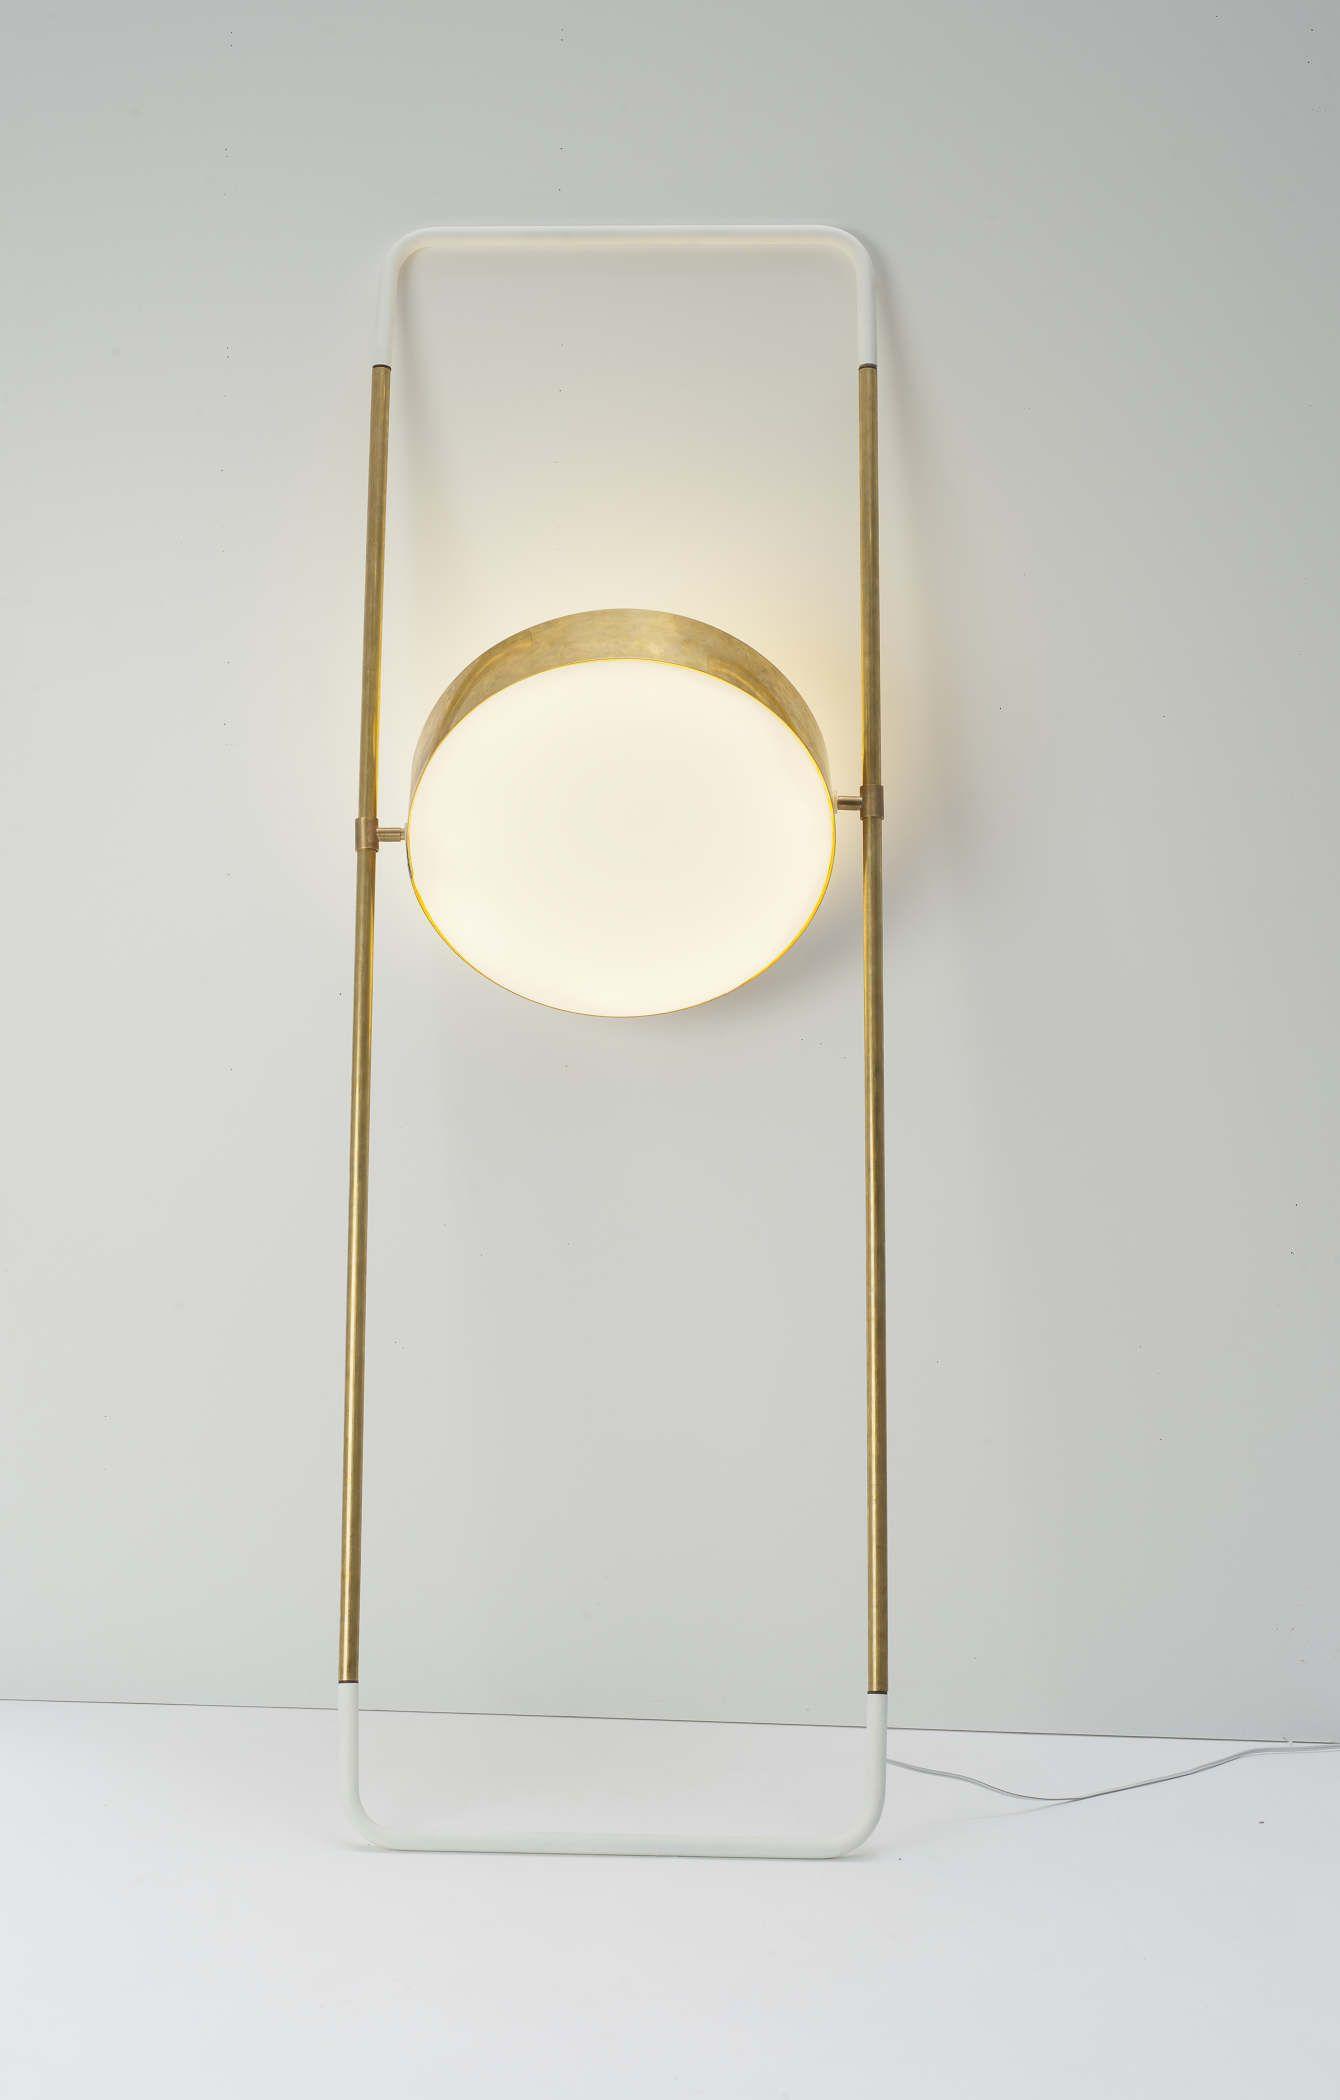 Light design nw lighting pinterest light design lights light design nw geotapseo Gallery